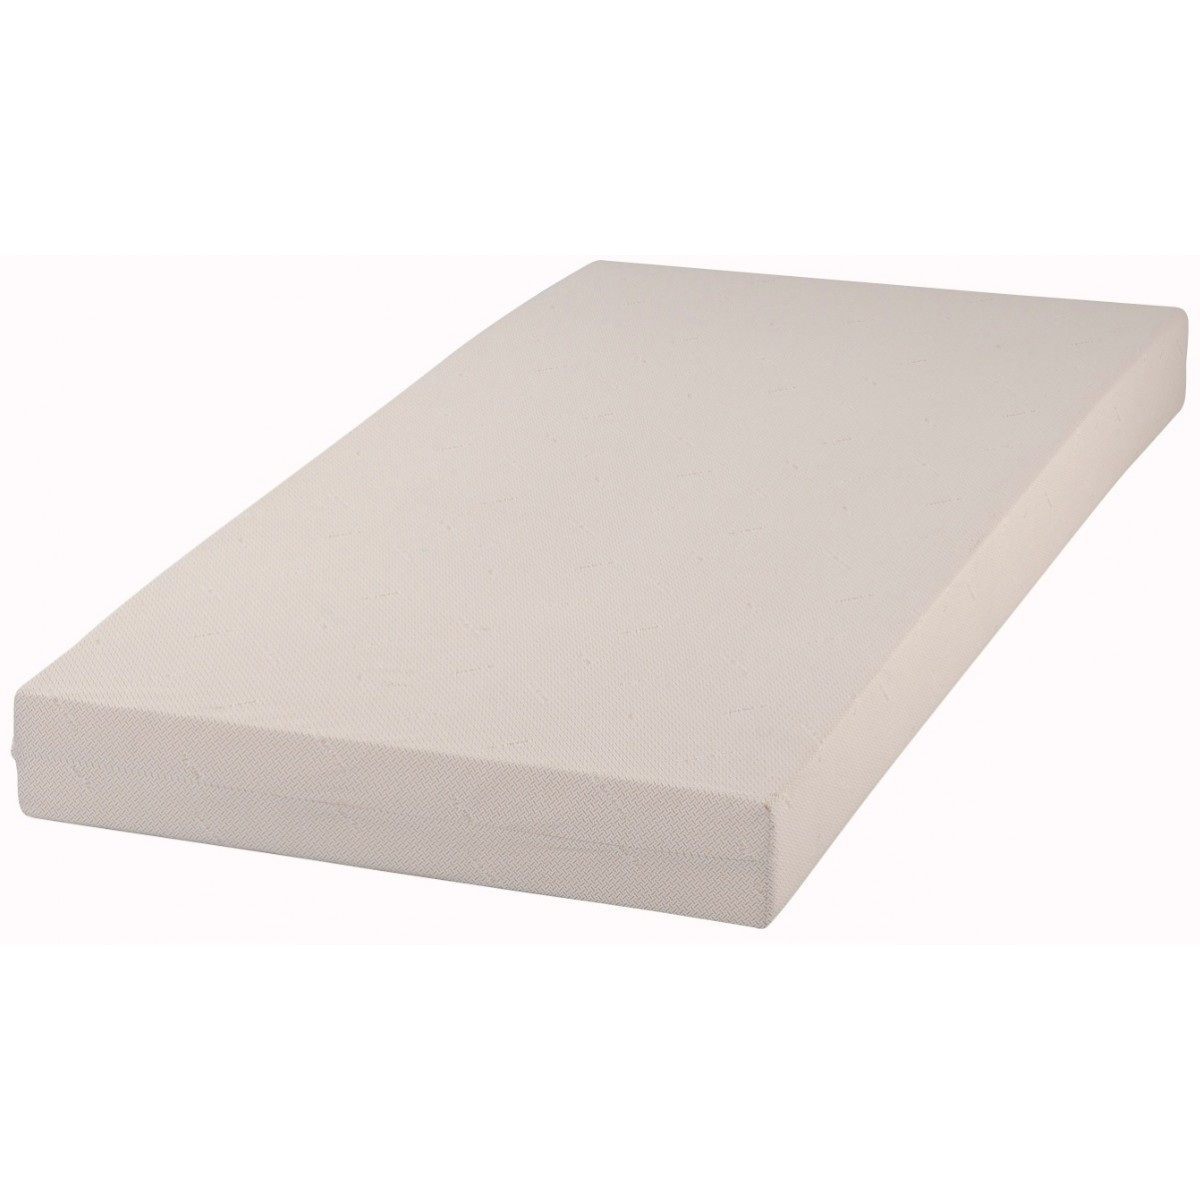 someo cmatelas pour bz en latex 140x130 60 catgorie. Black Bedroom Furniture Sets. Home Design Ideas